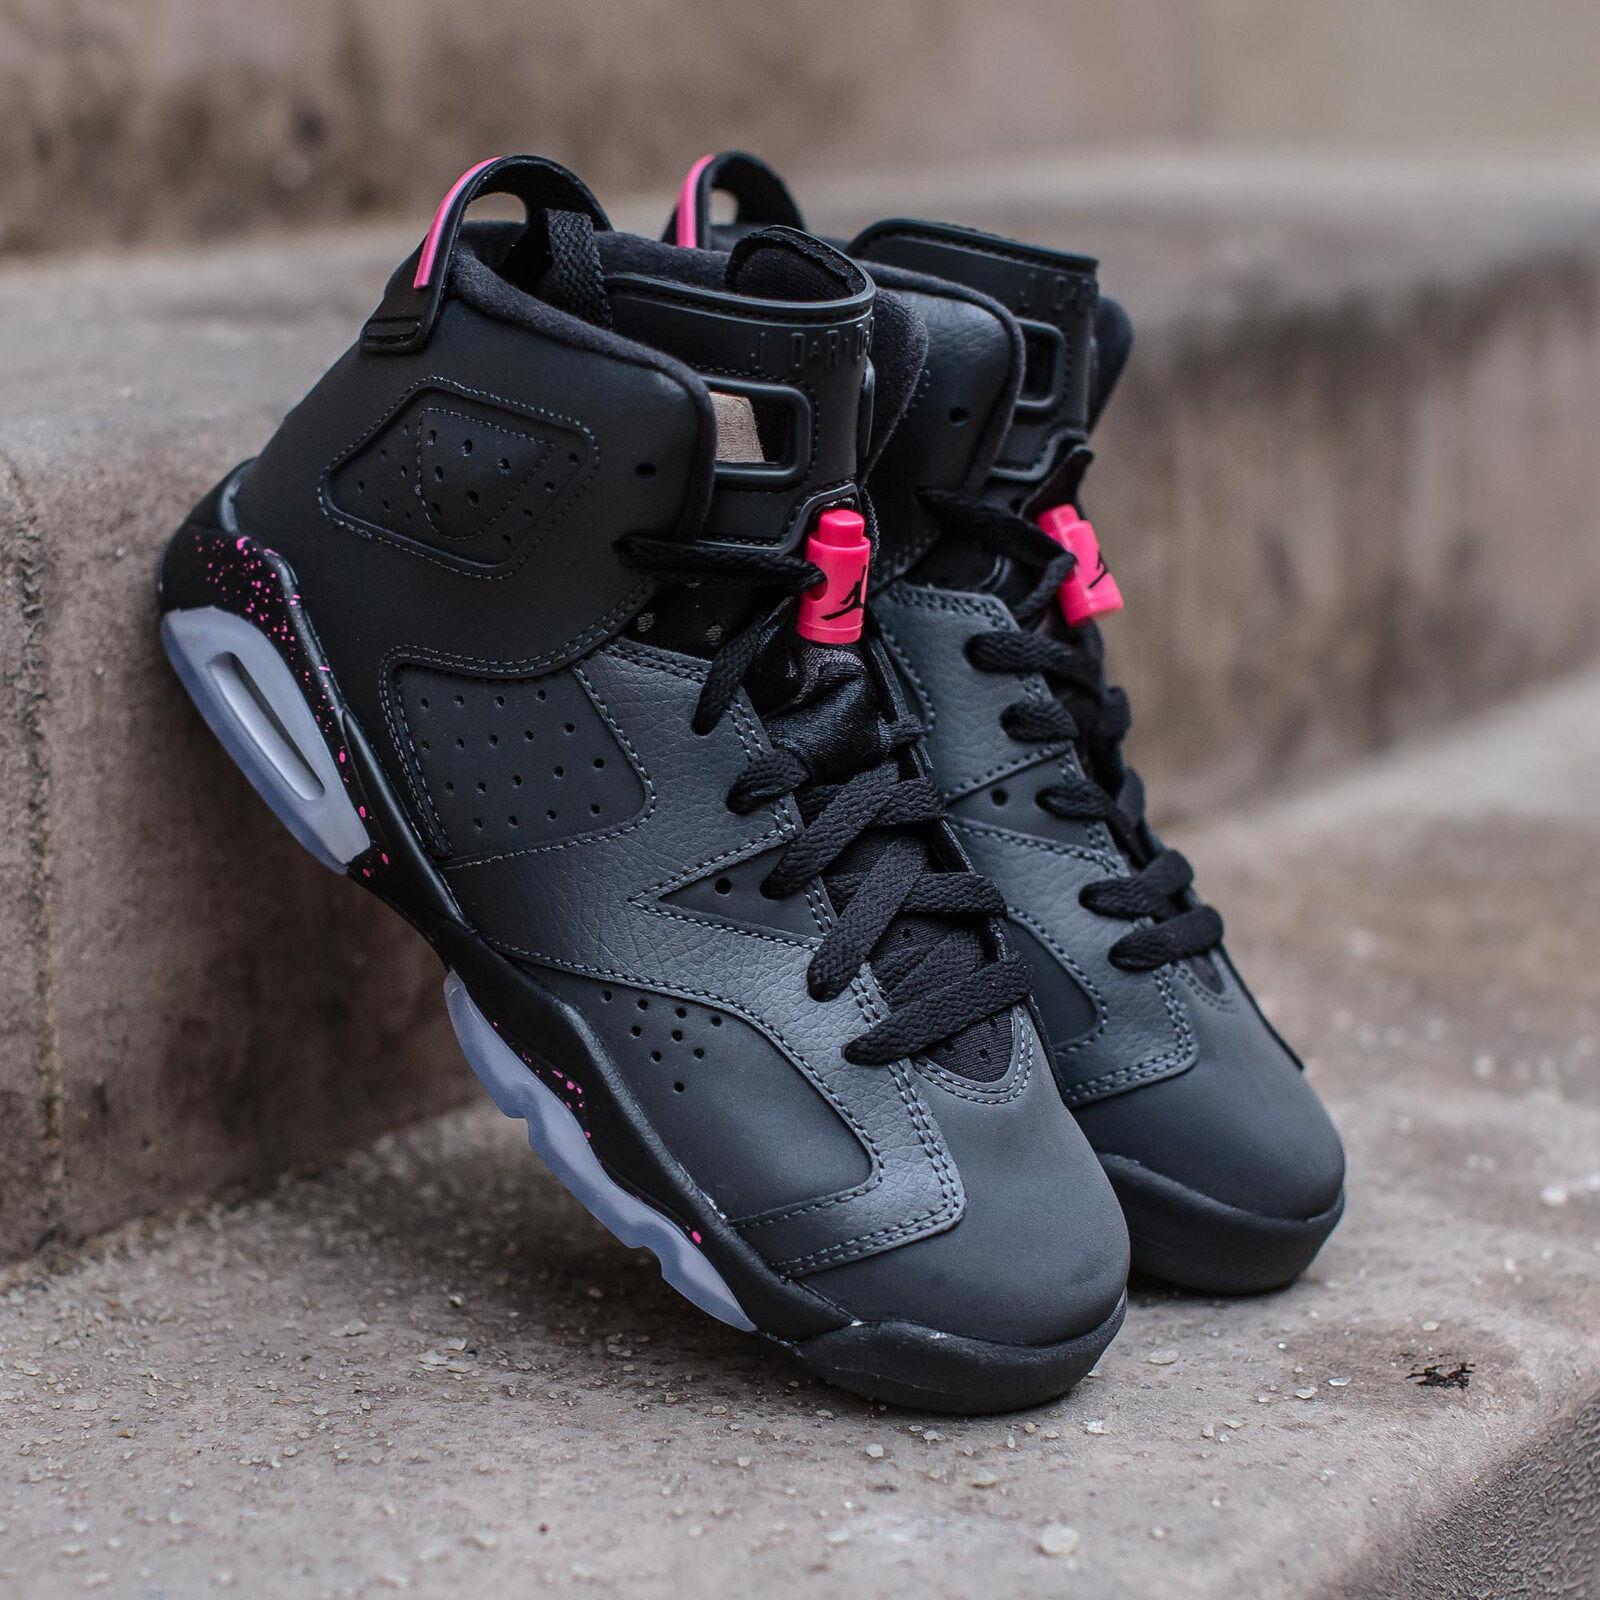 2017 Nike Air Jordan 6 VI Retro Black Hyper Pink Size 9.5y. 543390-008 1 2 3 8.5